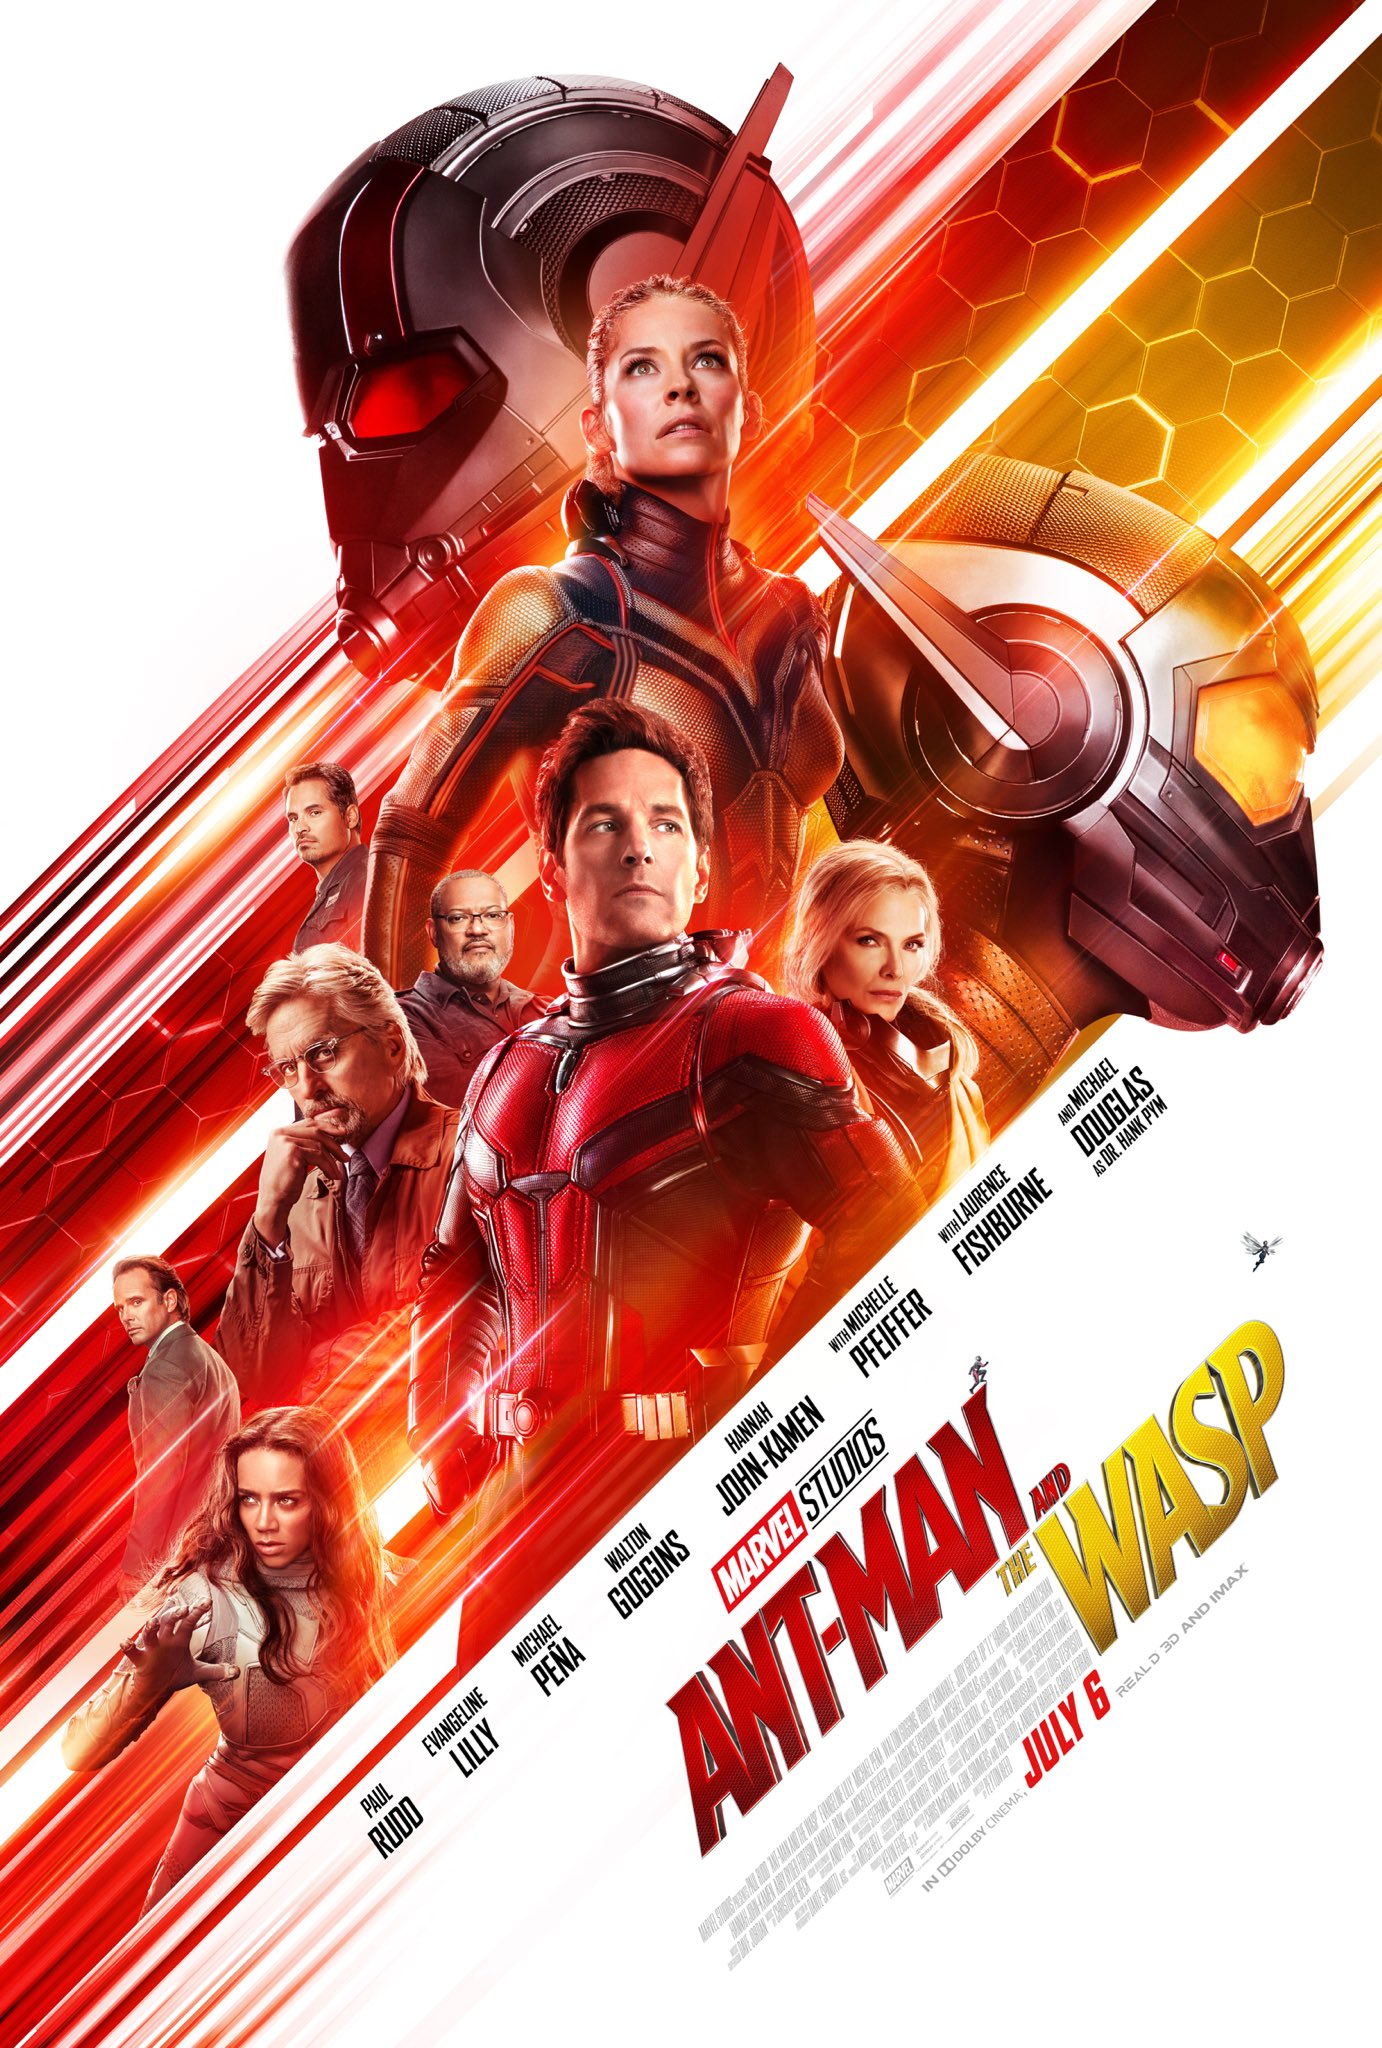 Oficiálny plagát na 20. marvelovku Ant-Man and the Wasp